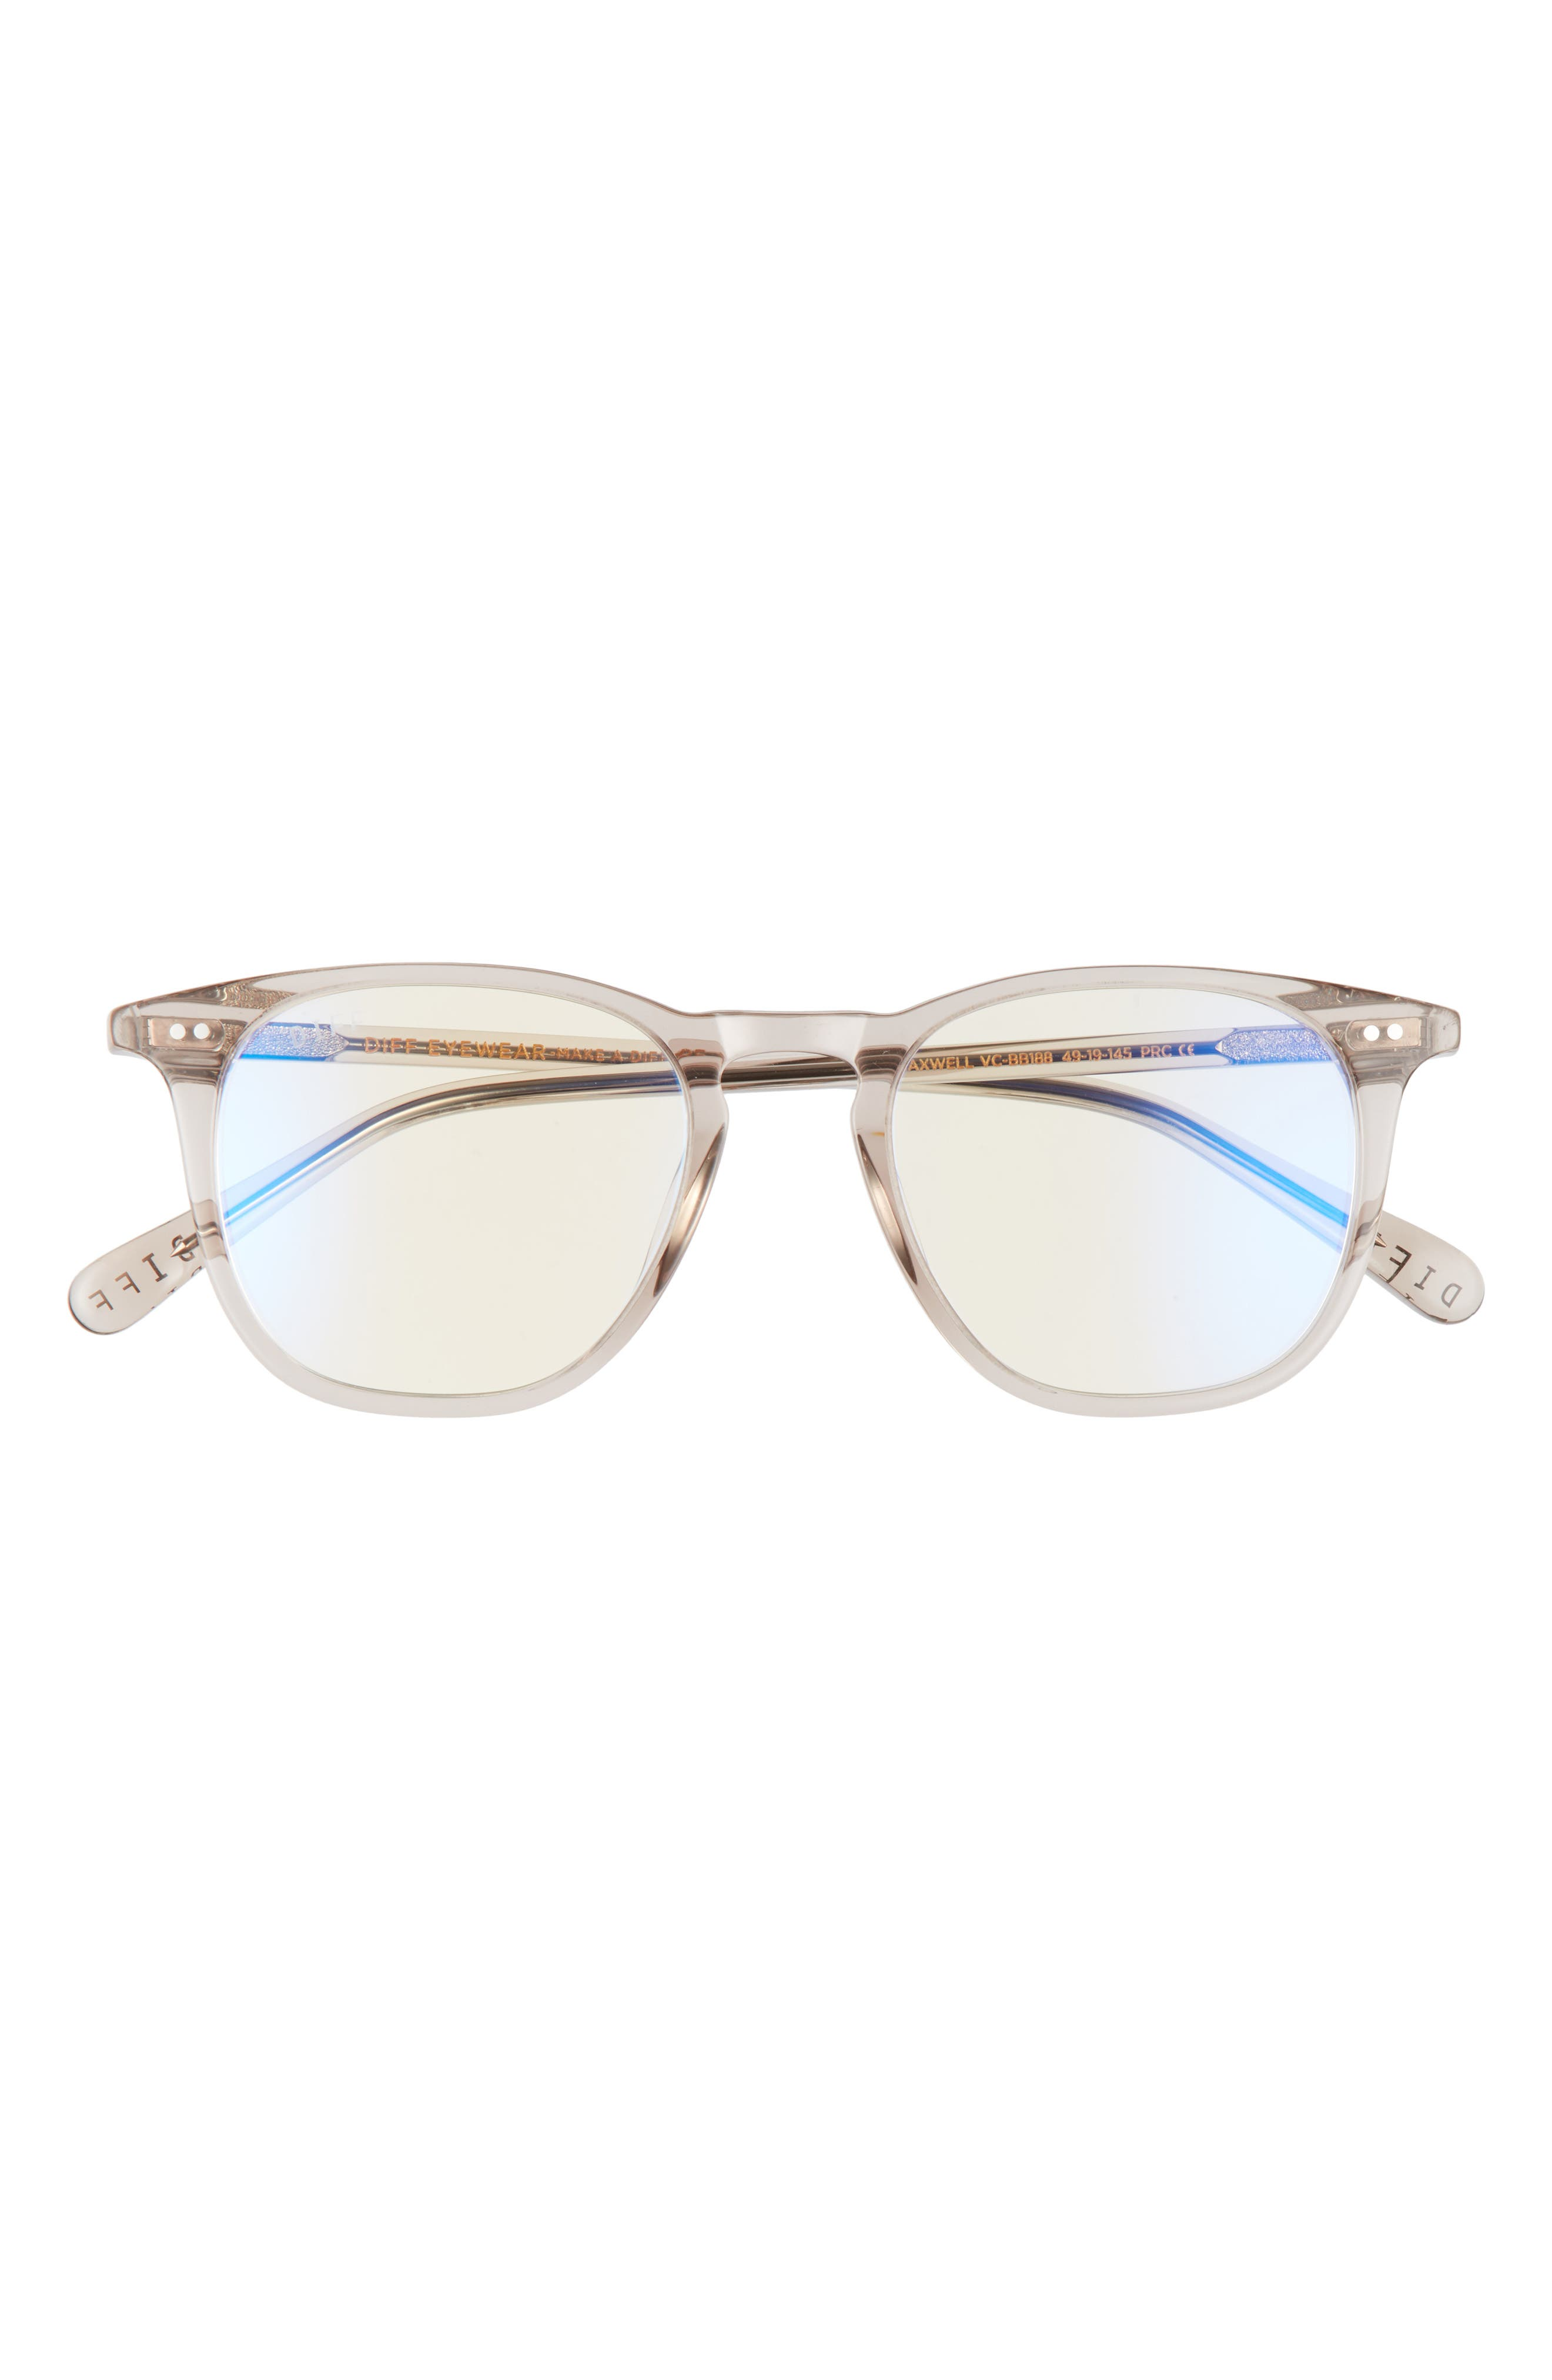 Maxwell 49mm Optical Glasses